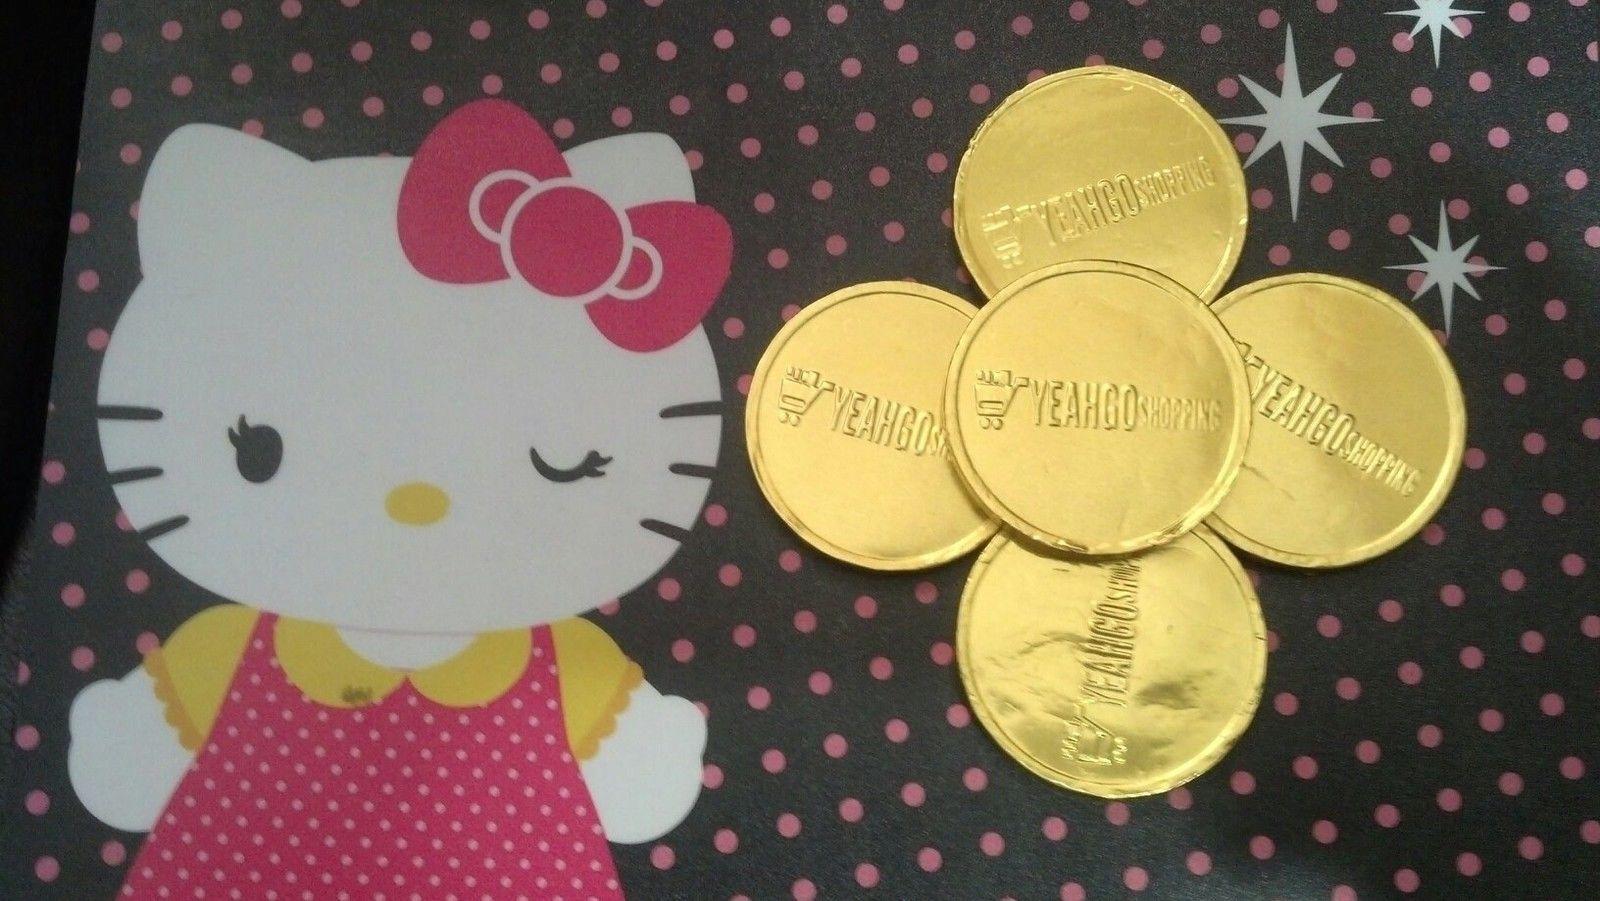 Chocolate Coin - .25 oz. (Gold : Dark Mint Chocolate) - 5 Coins